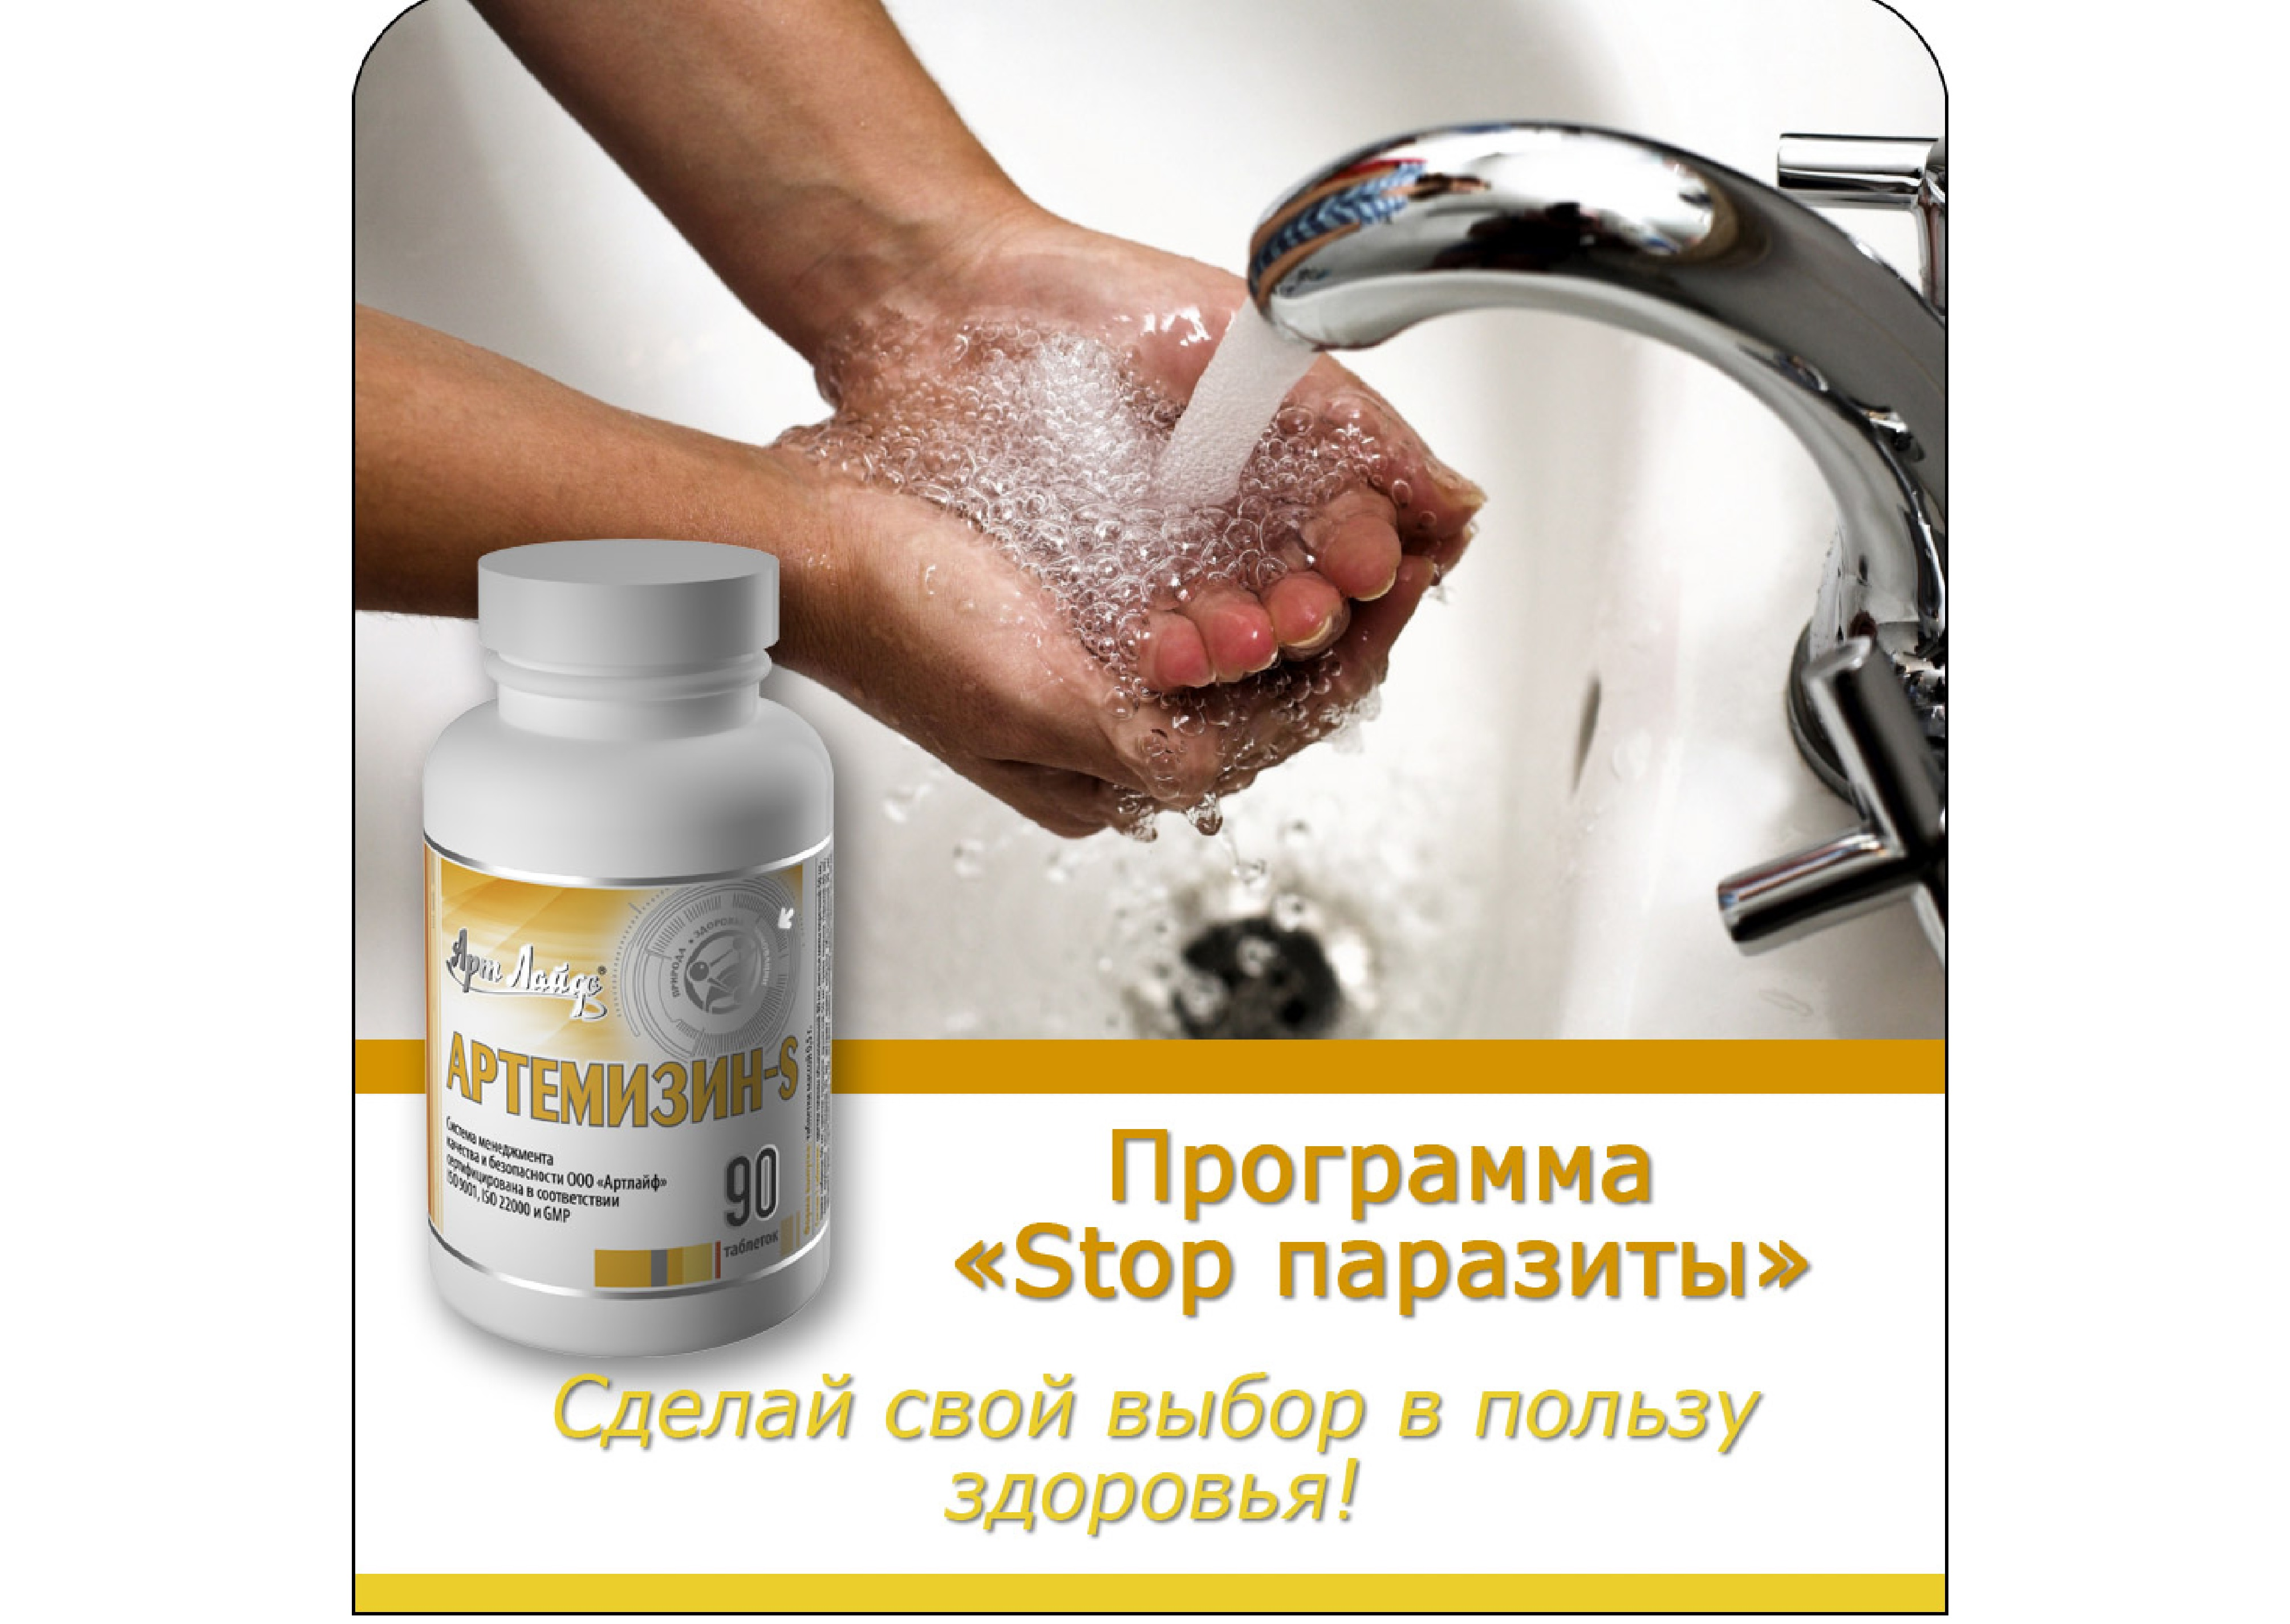 лекарства от паразитов грибков